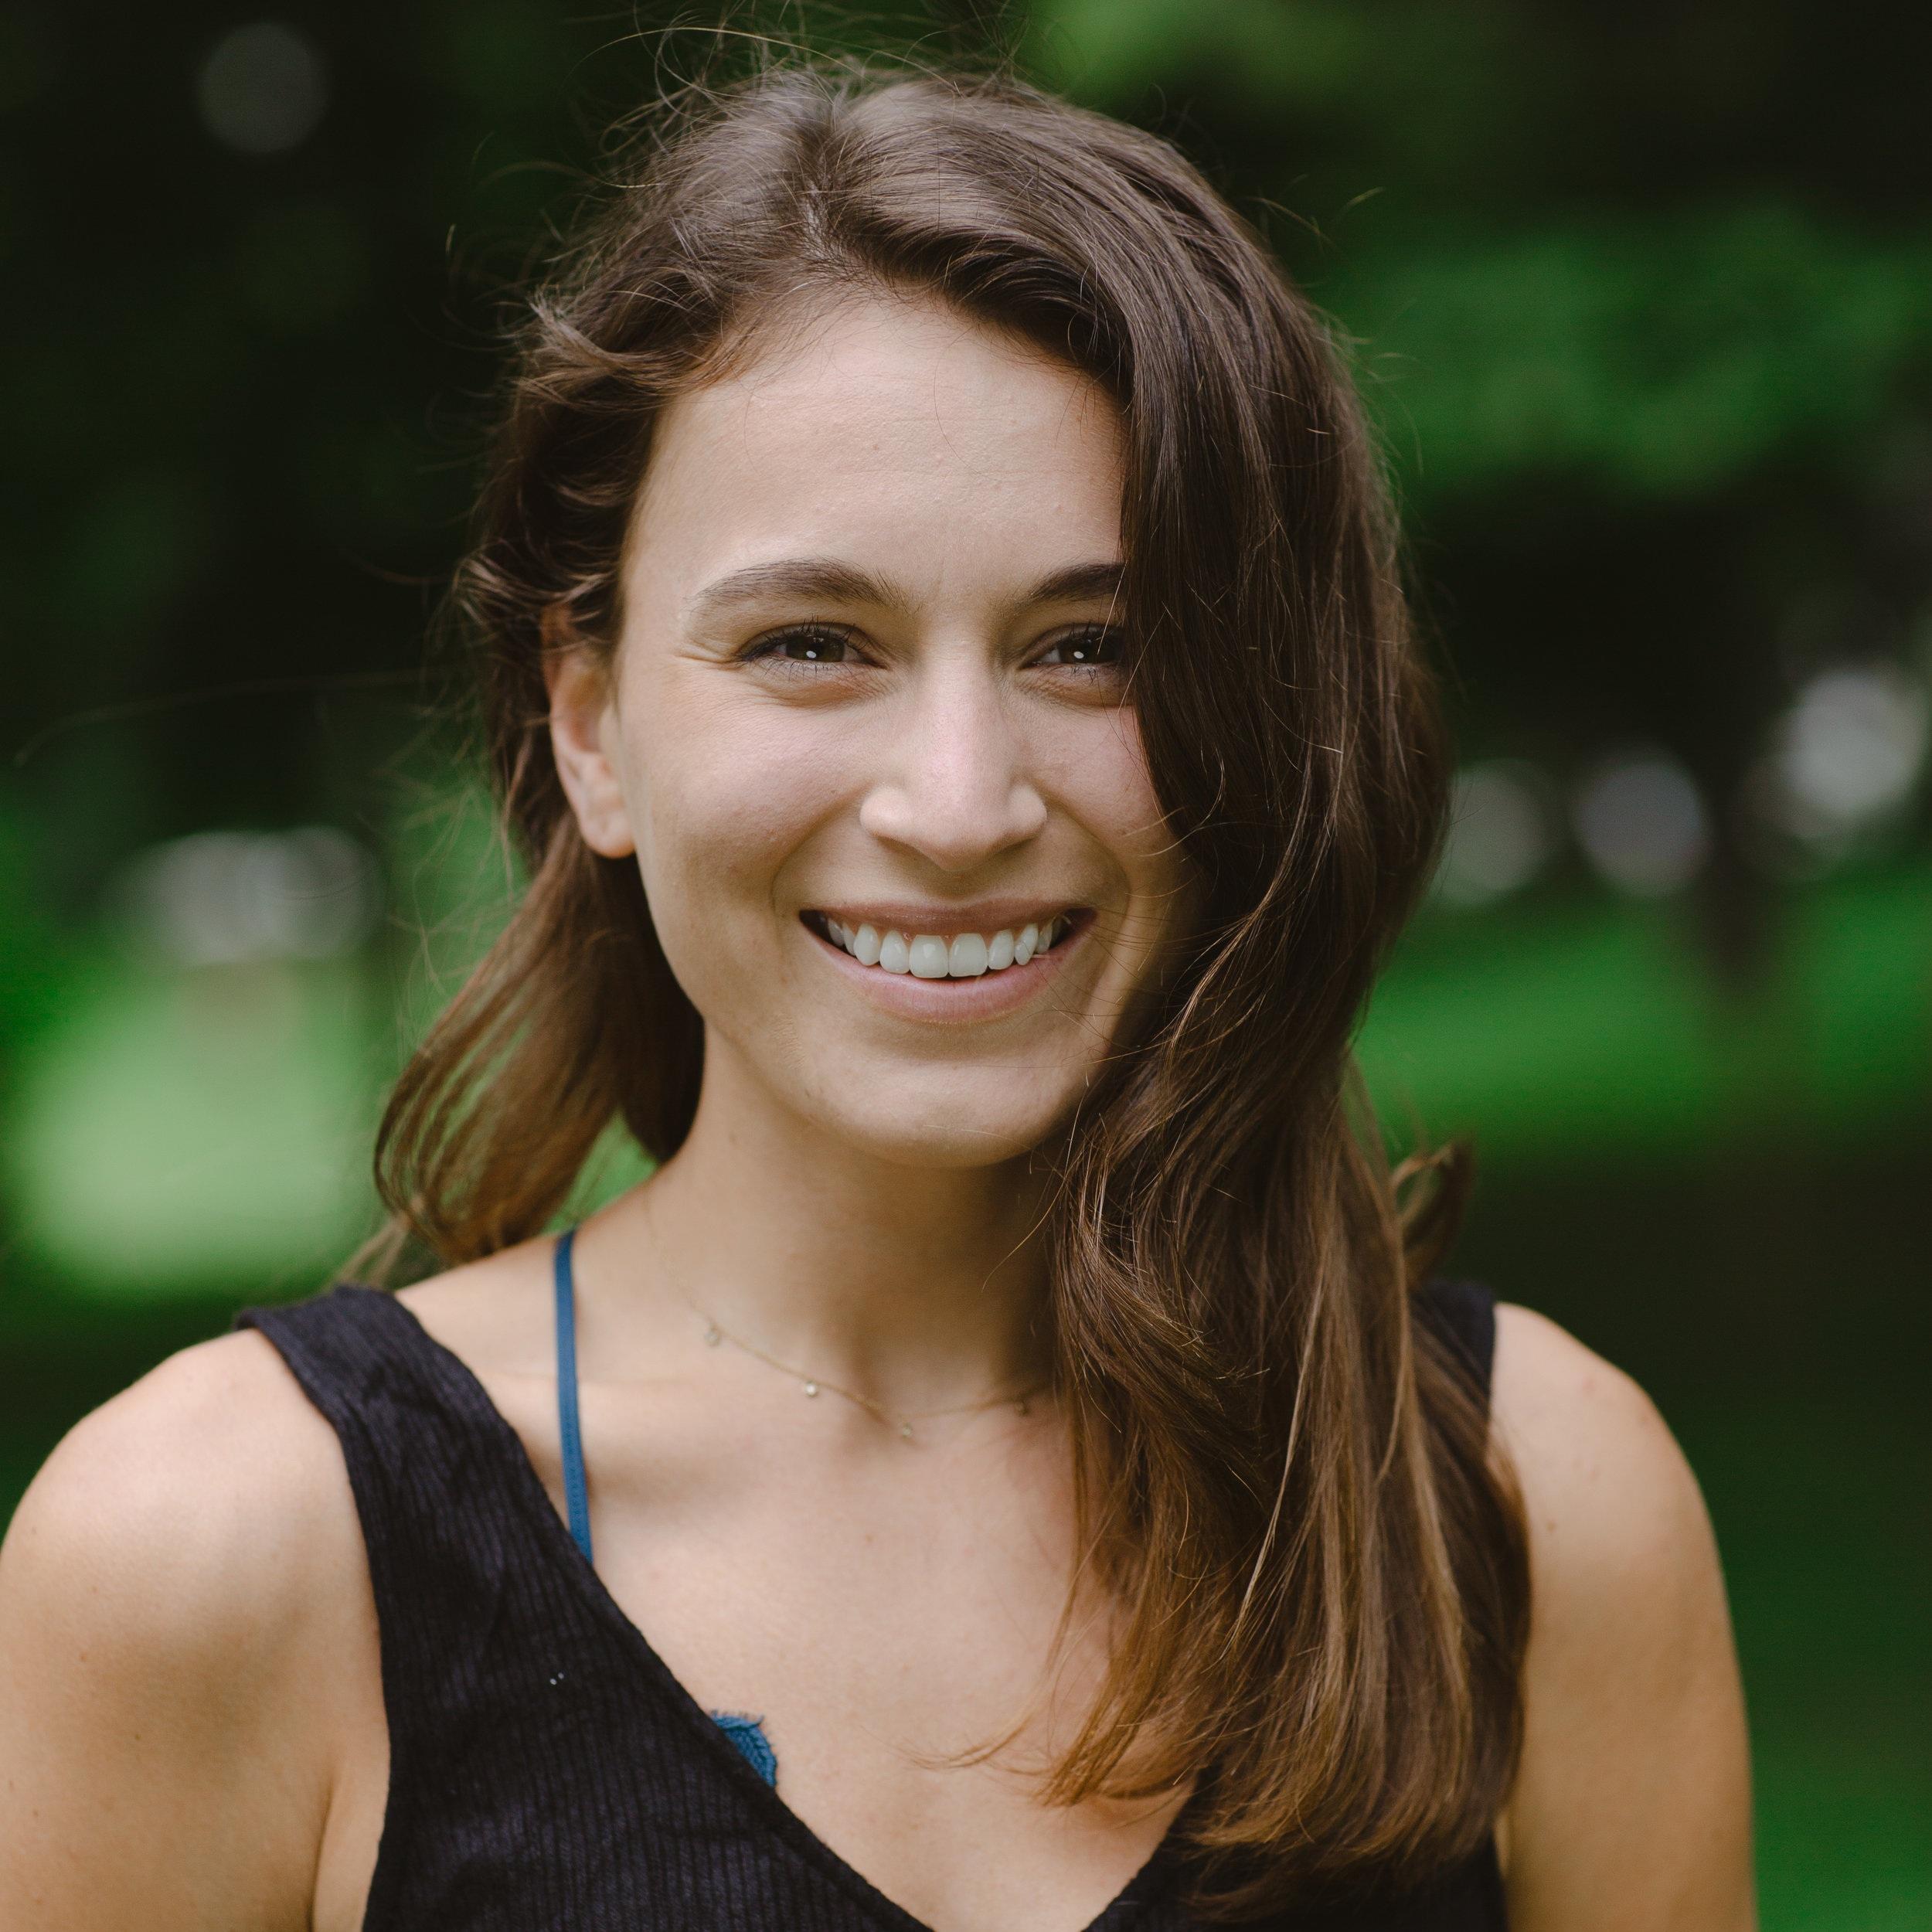 Nicole+Rauch+Social+Media+Director+in+Grand+Rapids